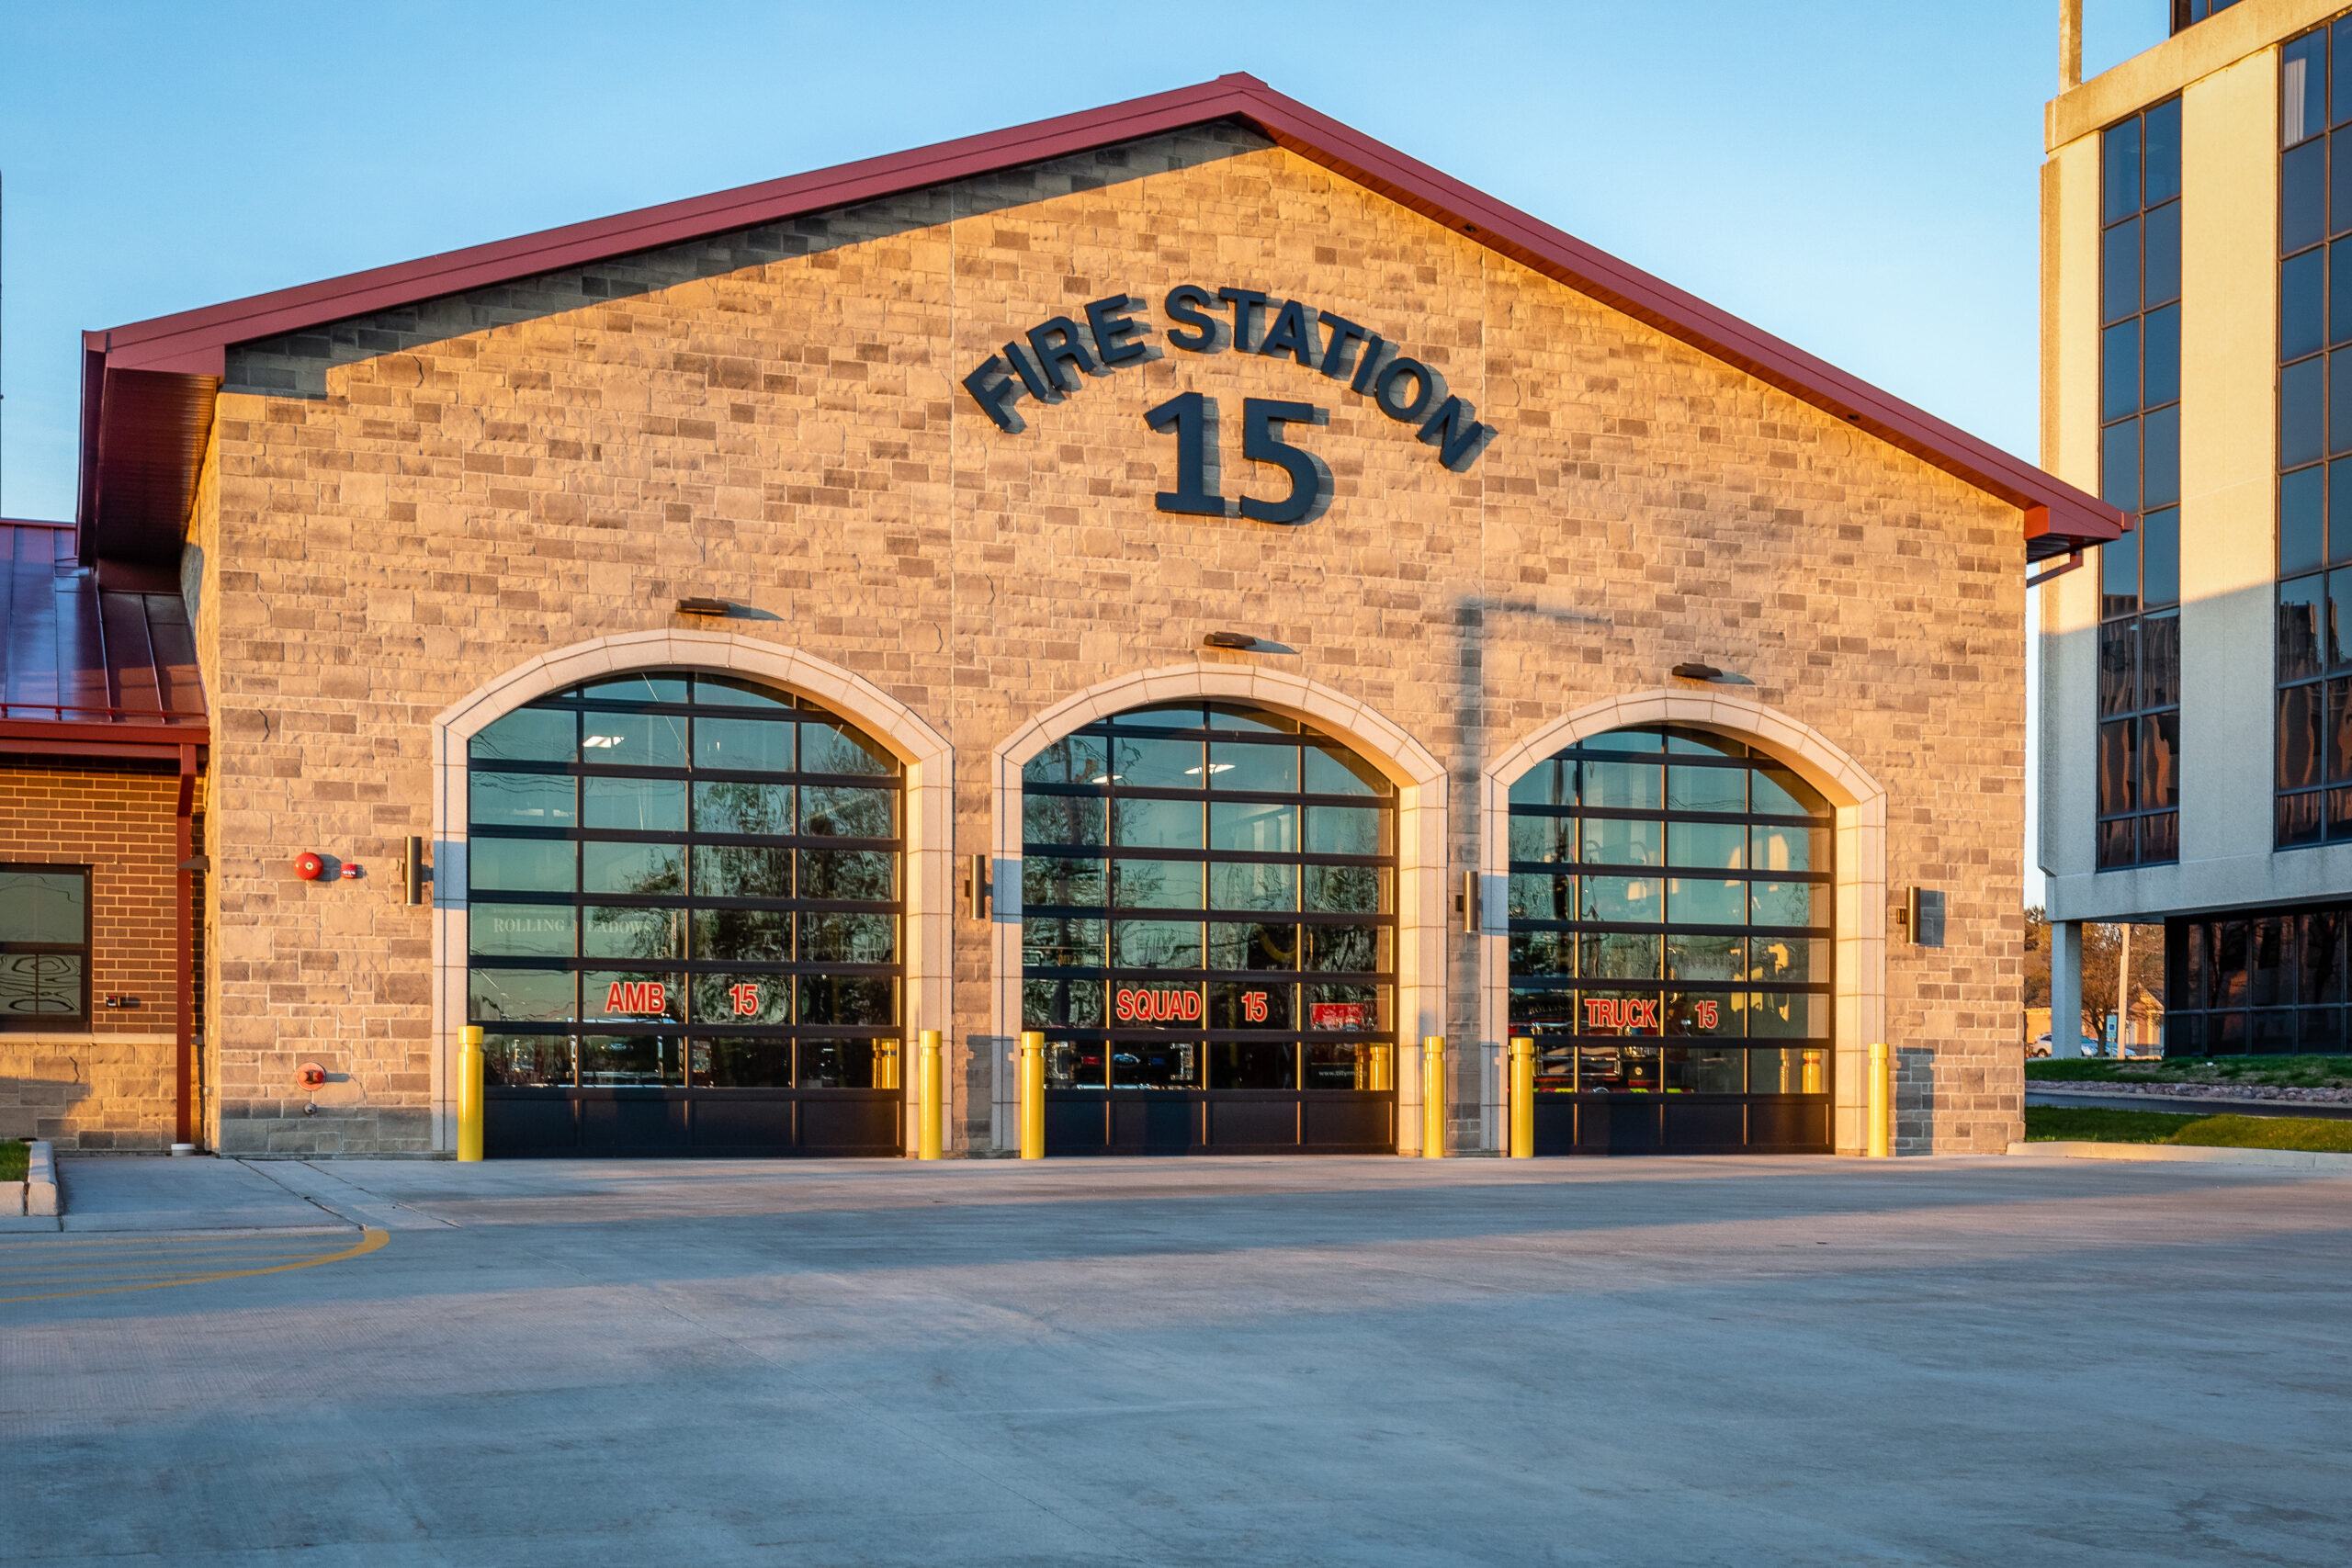 fire station in rolling meadows